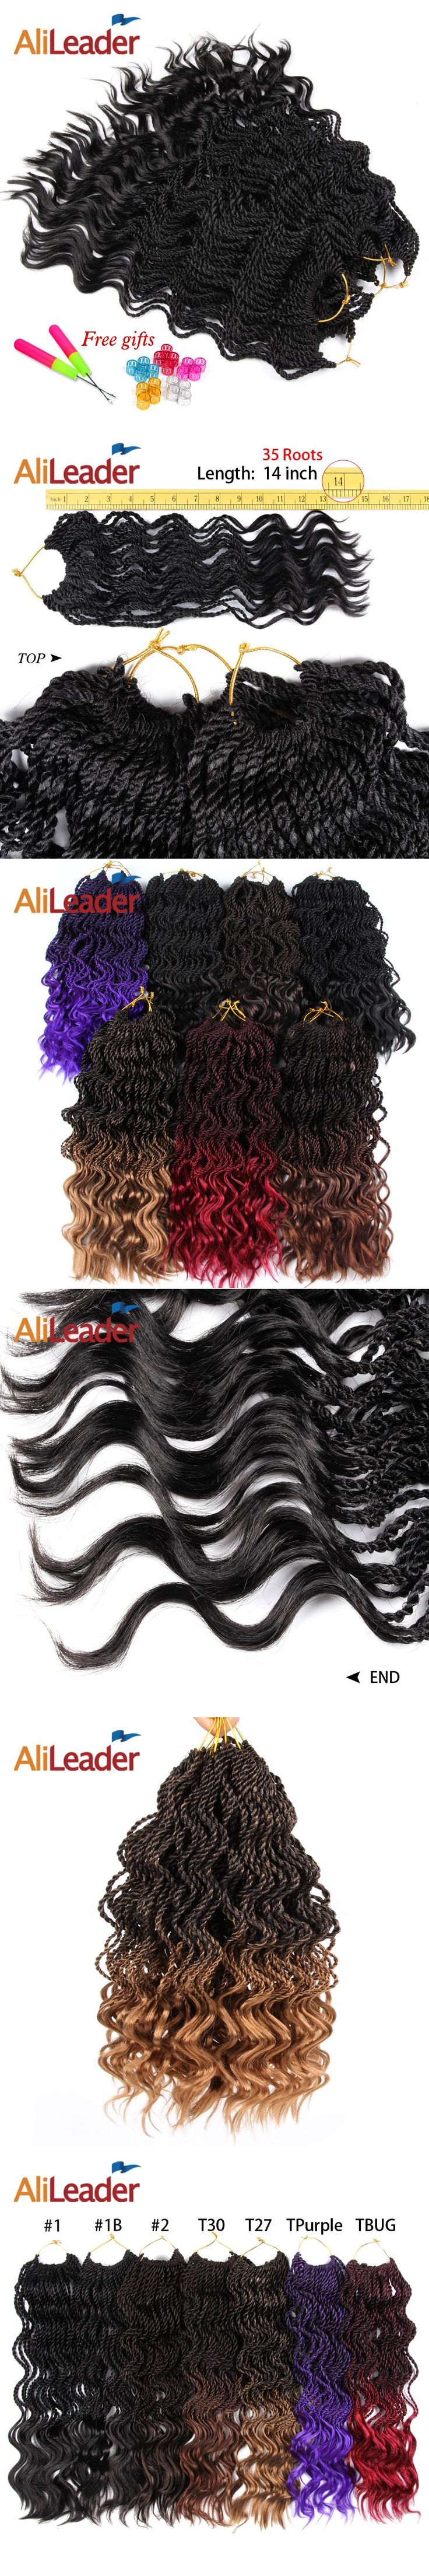 Alileader Crochet Hair Extension High Temperature Curly Senegalese Twist Braid Synthetic Braiding Hair 1-10 Packs Brown Purple